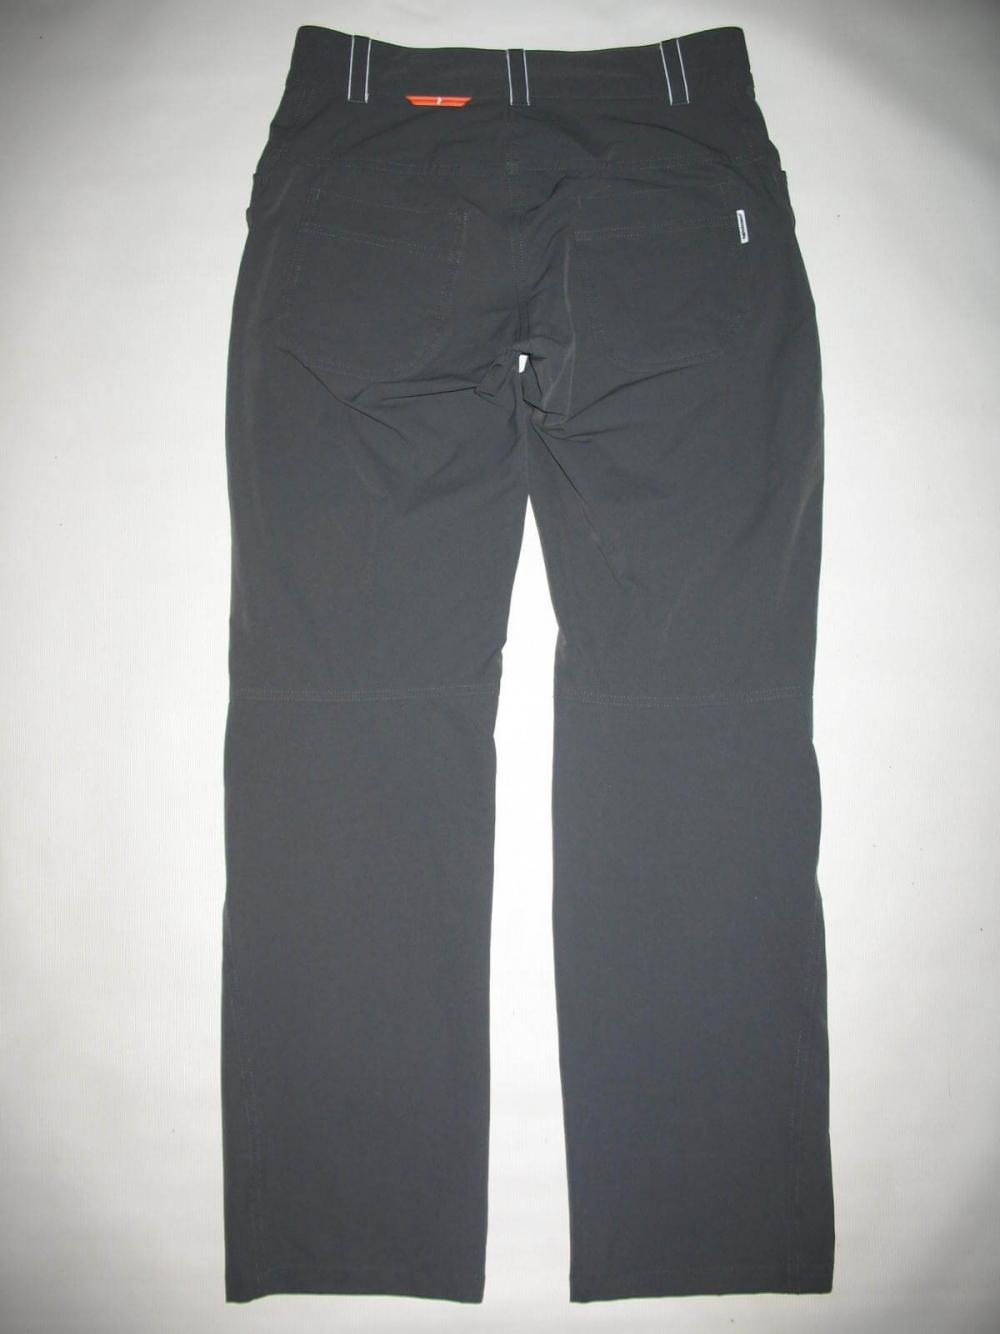 Штаны PEAK PERFOMANCE agile pants lady/unisex (размер S/M) - 2